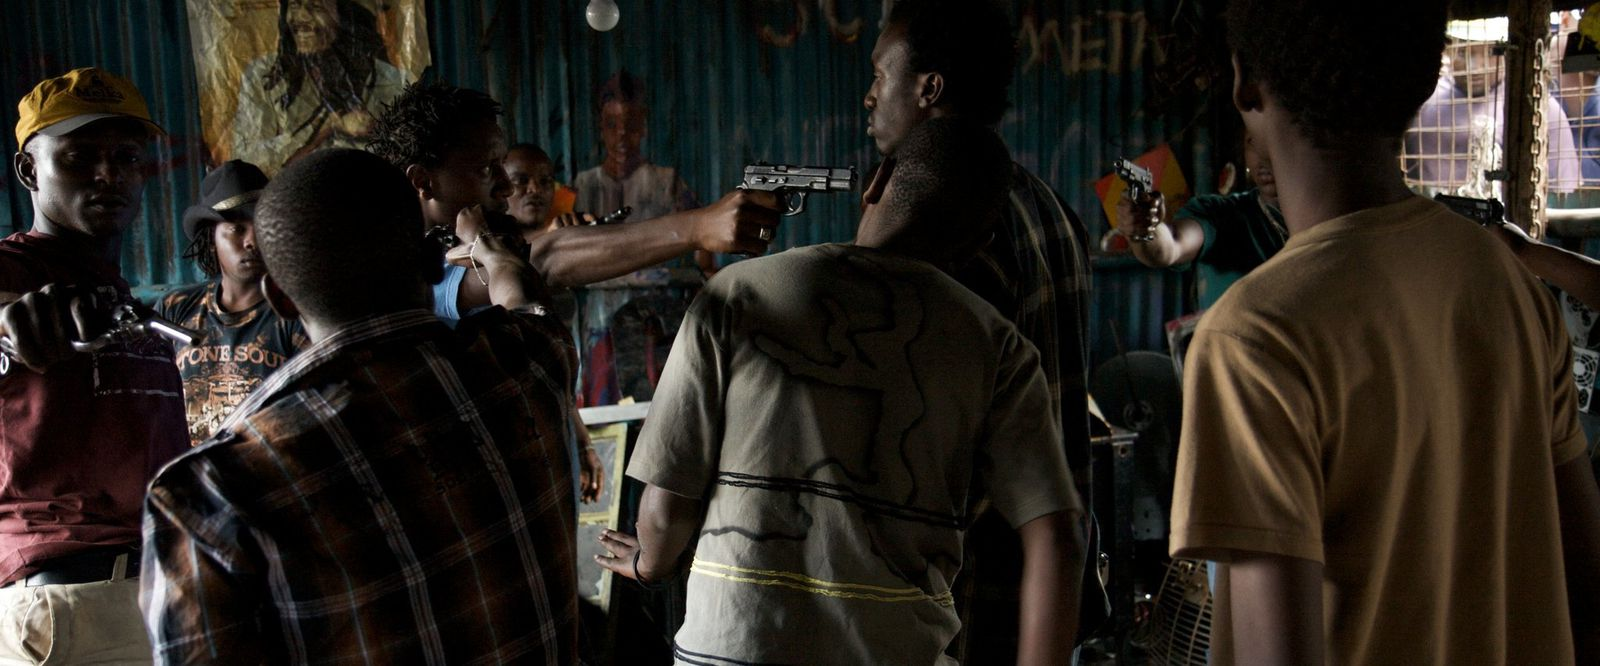 Shooting location Nairobi City